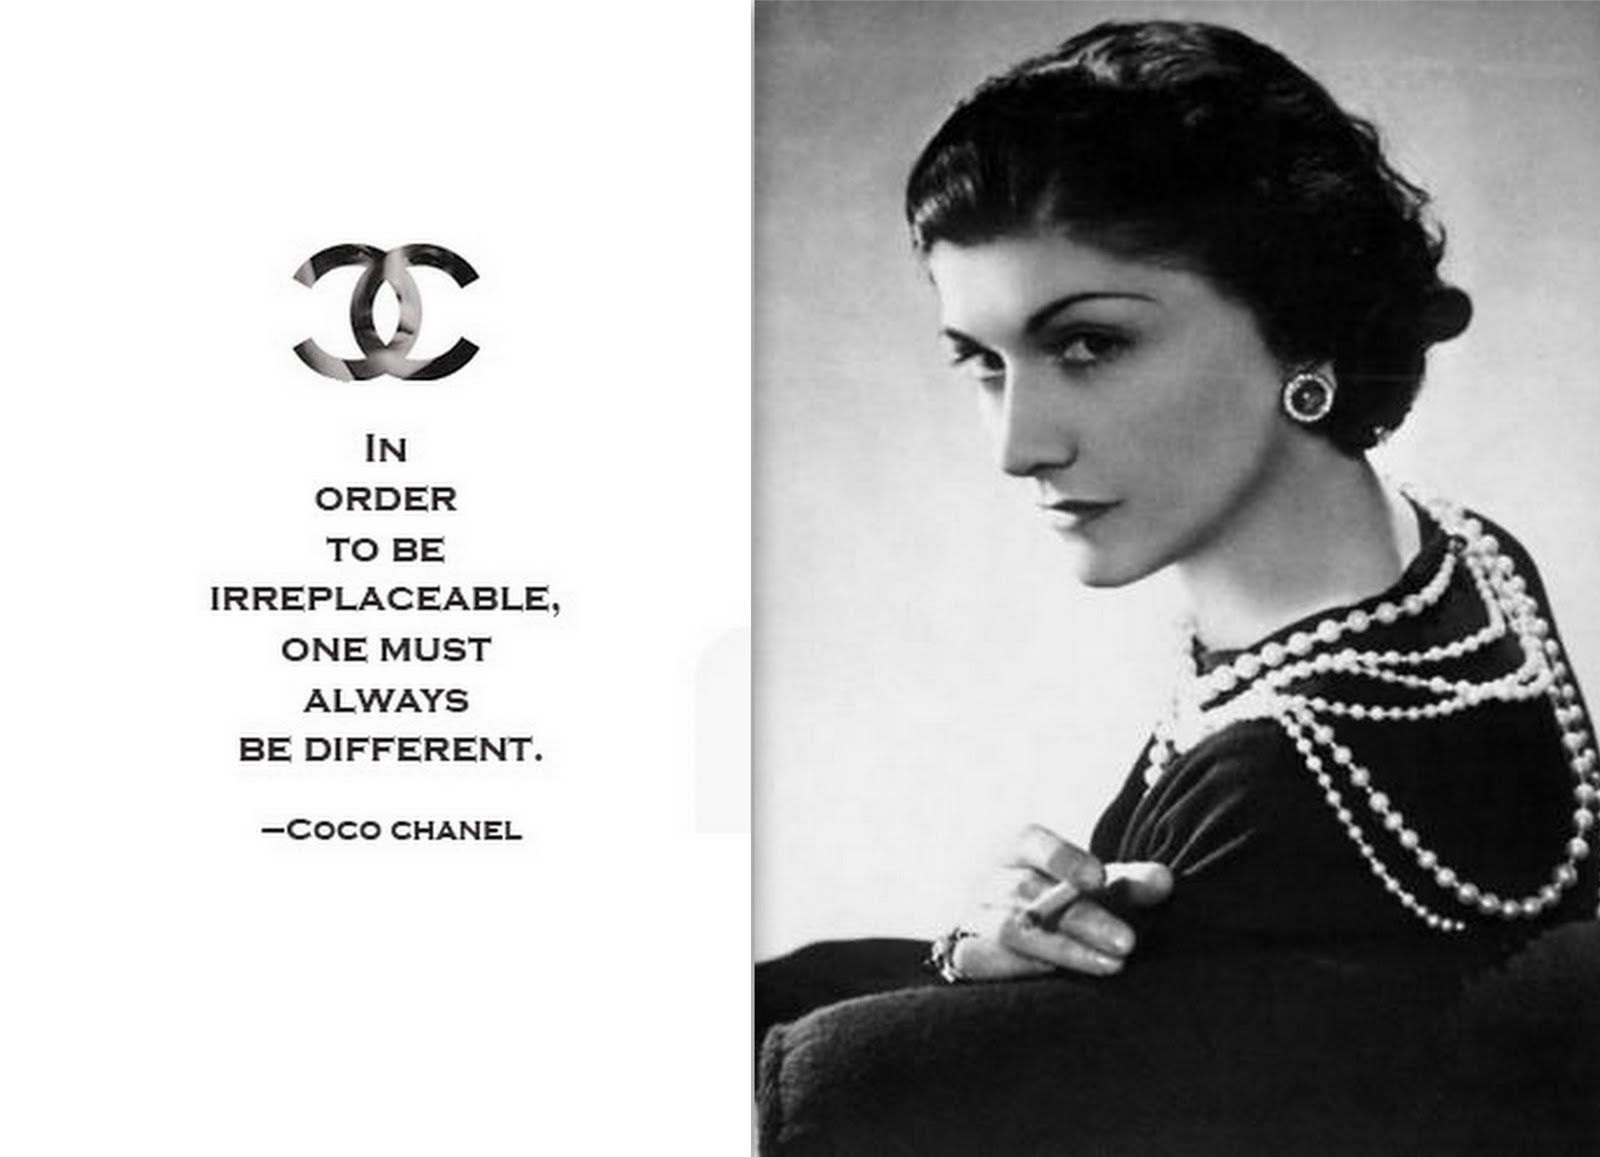 Chanel By Kinga Paszko On Prezi